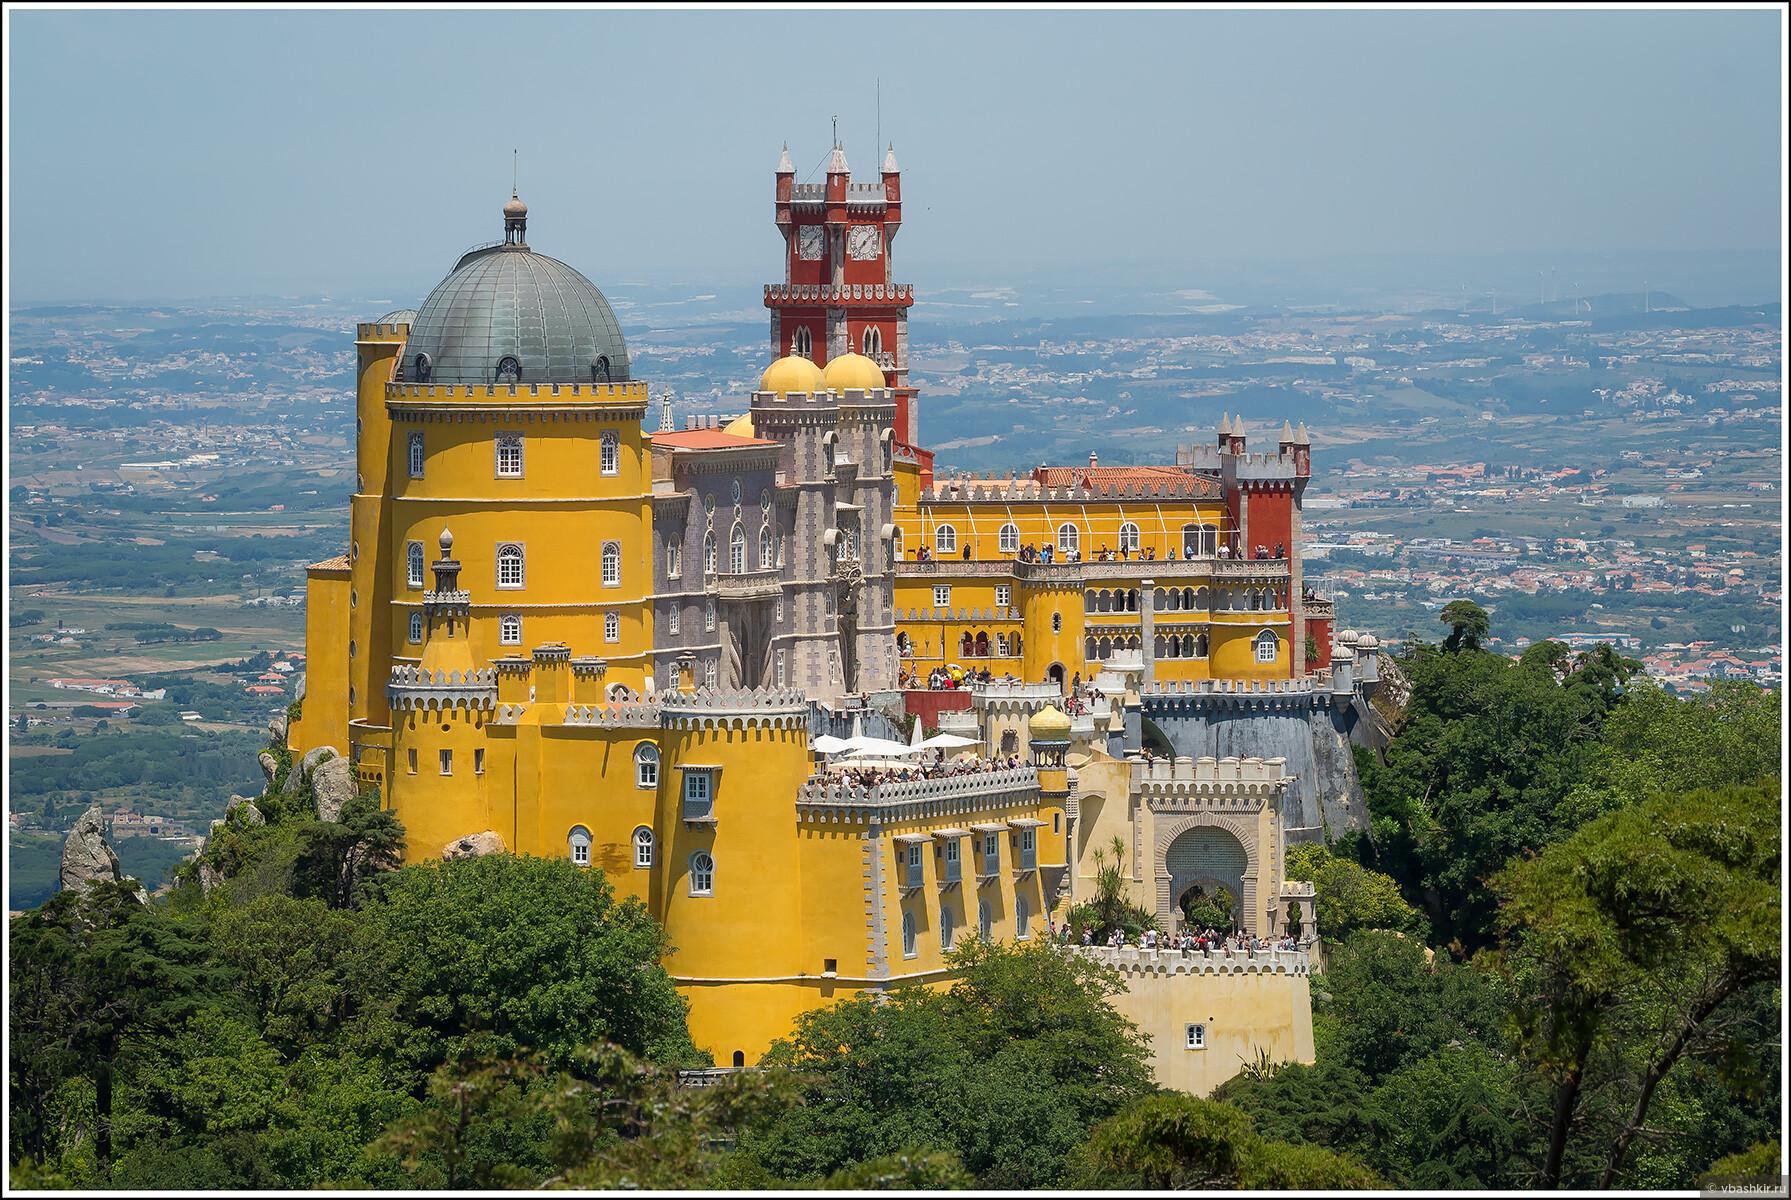 Дворец Пена, Синтра. За наводку на точку спасибо @iffoneoff!)), Я и лаг у троп. Португалия! (палиндром)